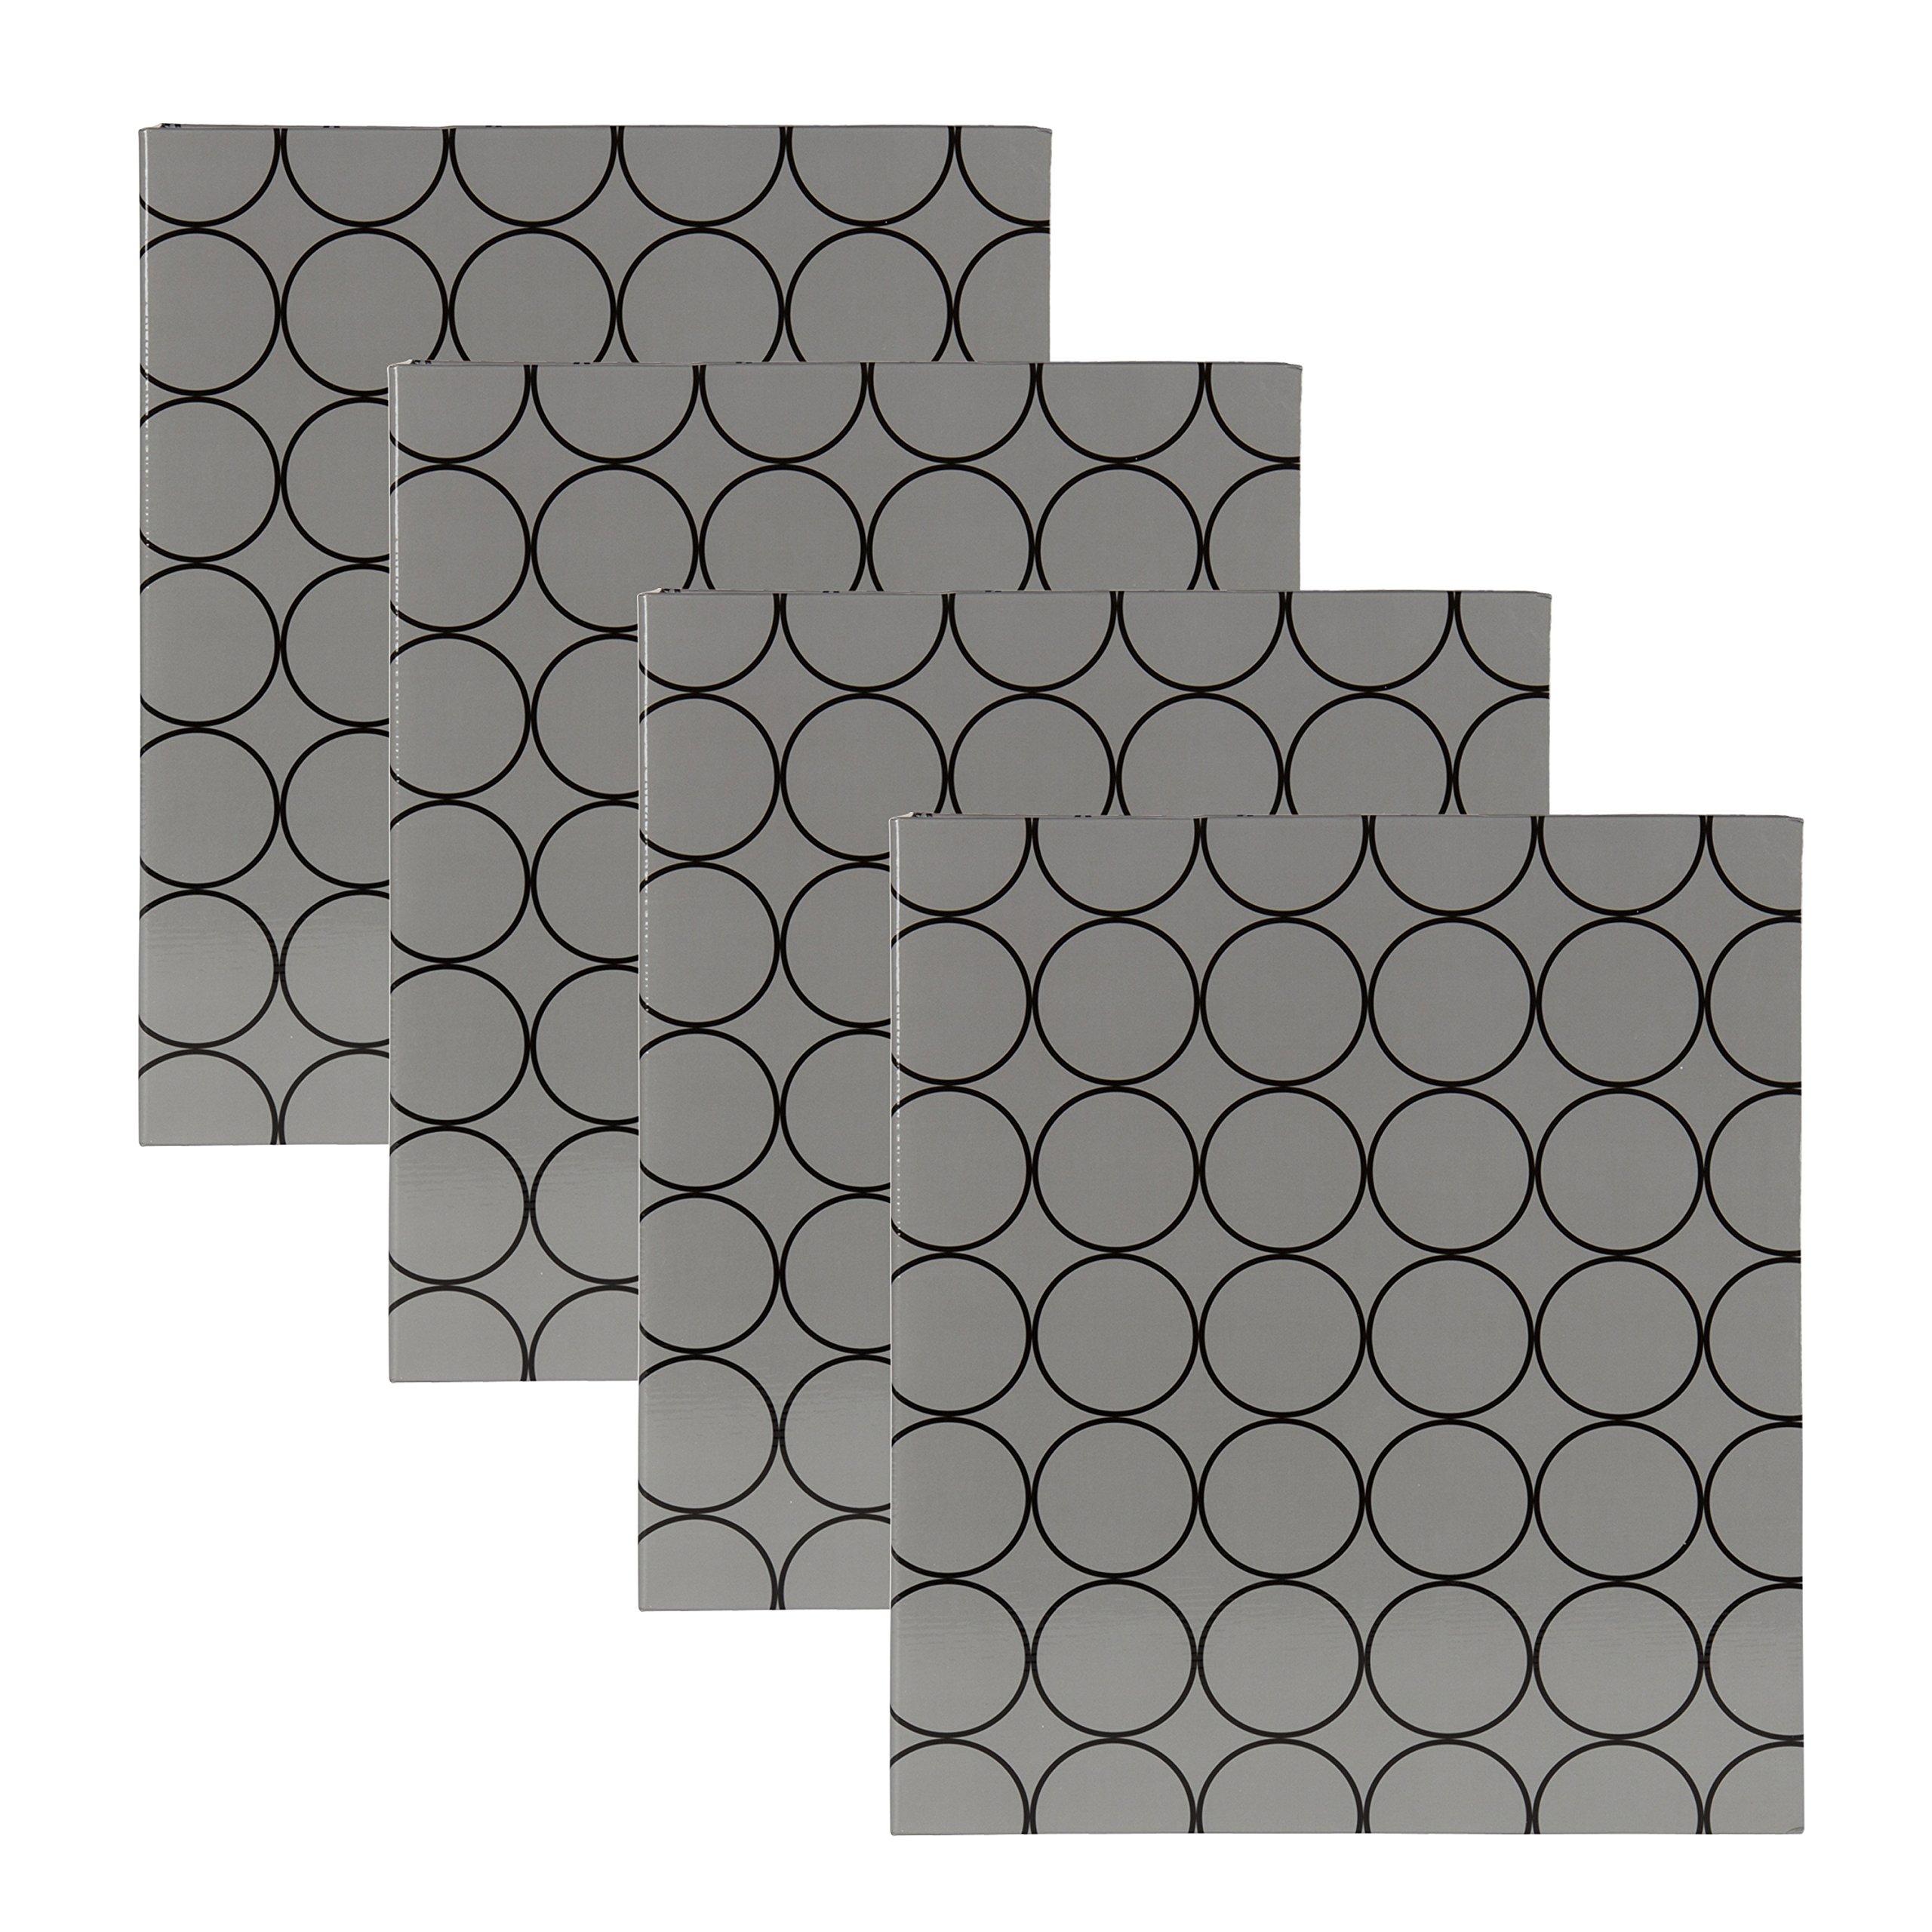 DesignOvation Patterns Black and Gray Photo Album, Holds 440 4x6 Photos, Set of 4